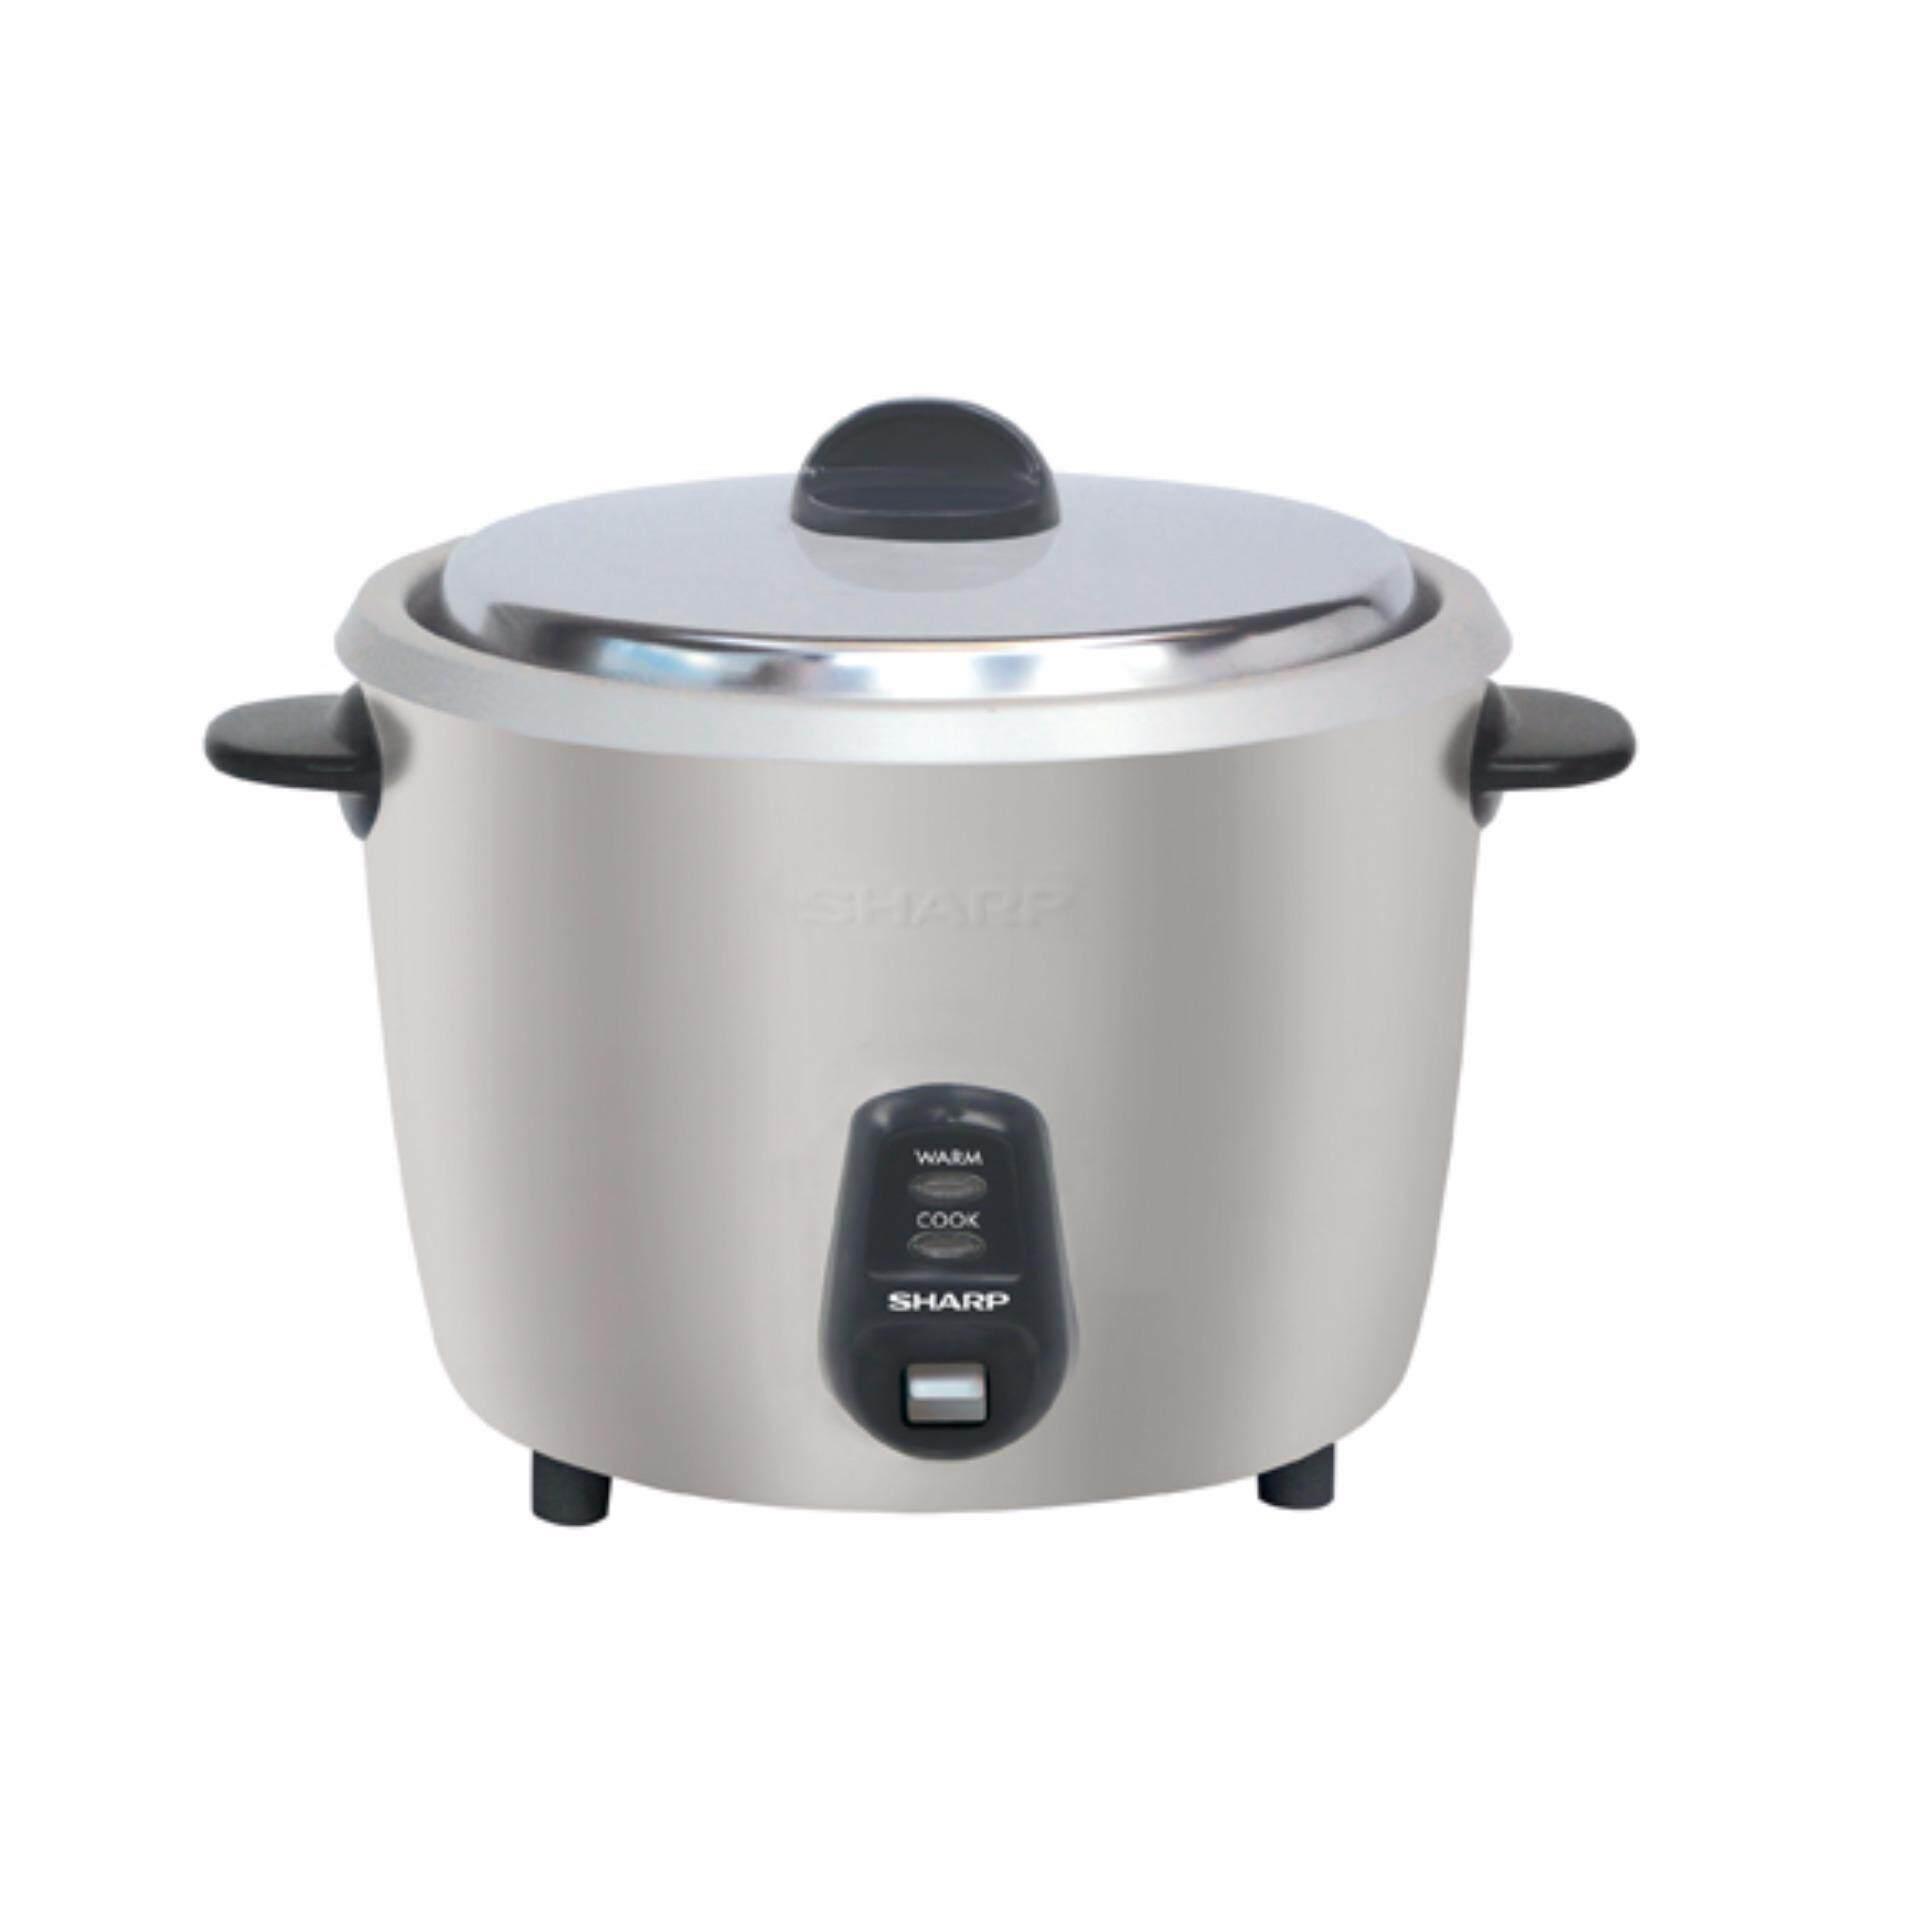 Sharp 2.8L Rice Cooker KSH-228 (Random Colour)